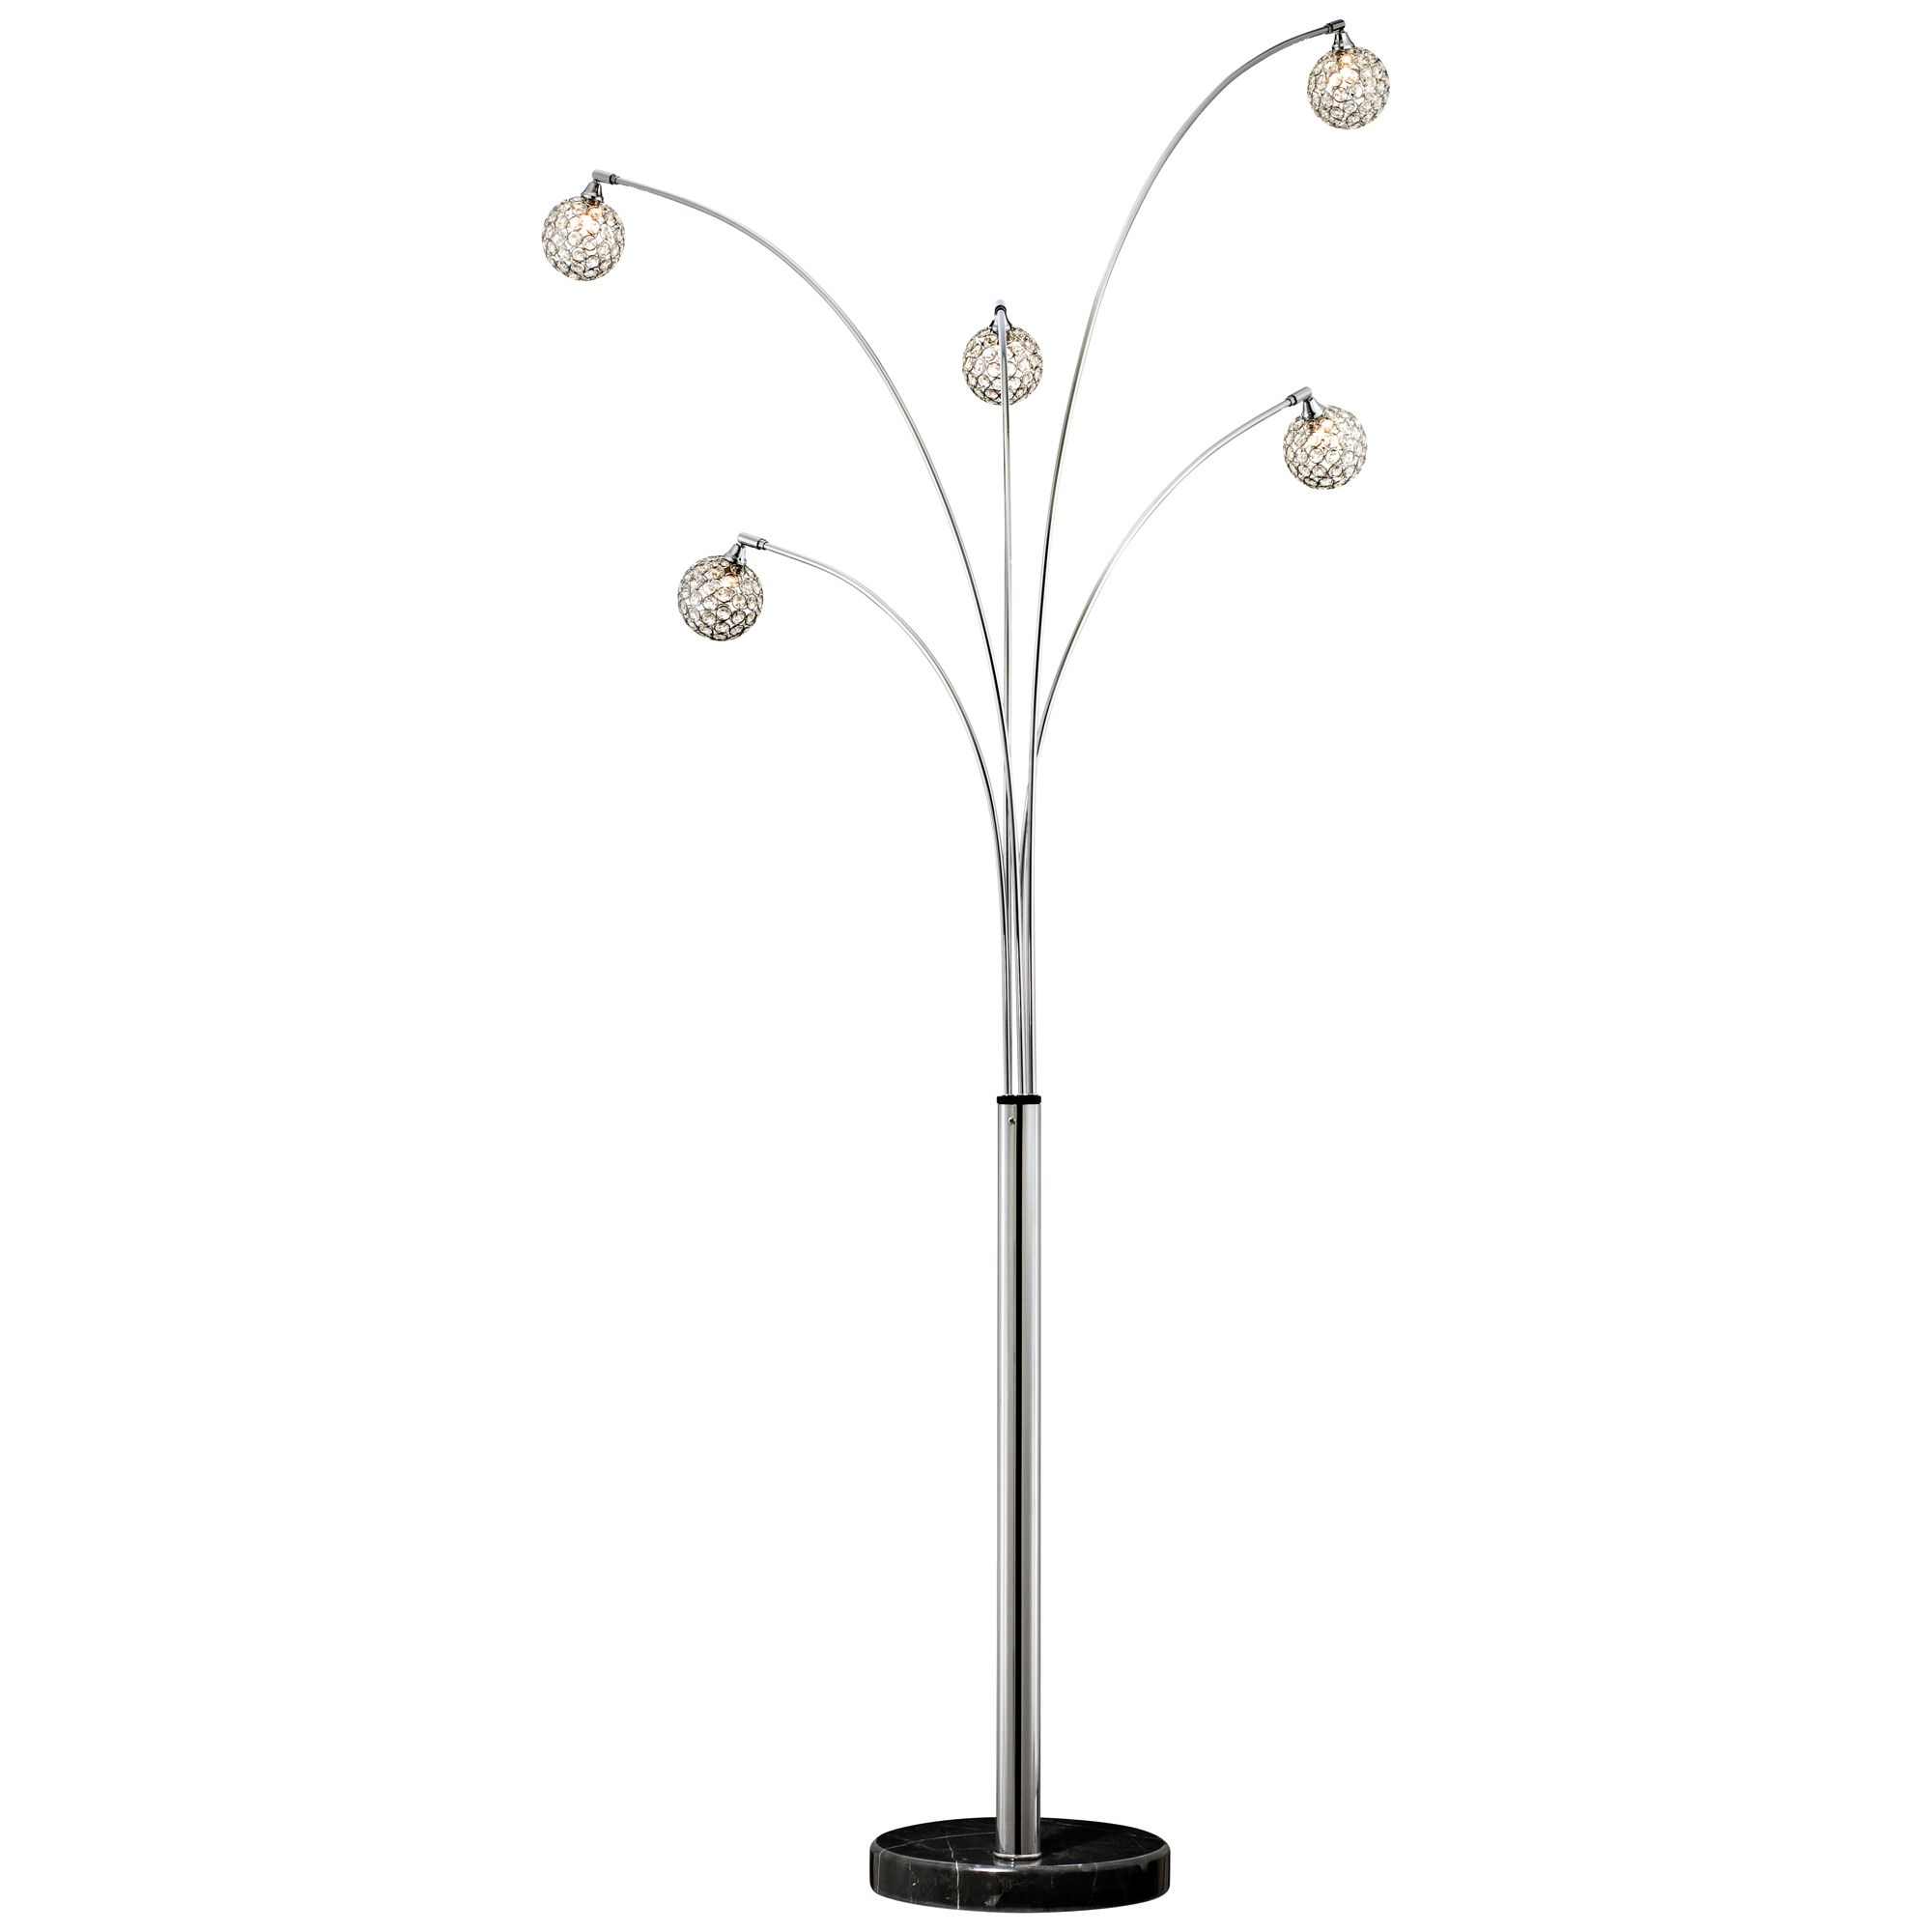 Possini Euro Design Mid Century Modern Arc Floor Lamp 5 Light Chrome Marble Base Crystal Ball Shades Foot Dimmer For Living Room Walmart Com Walmart Com